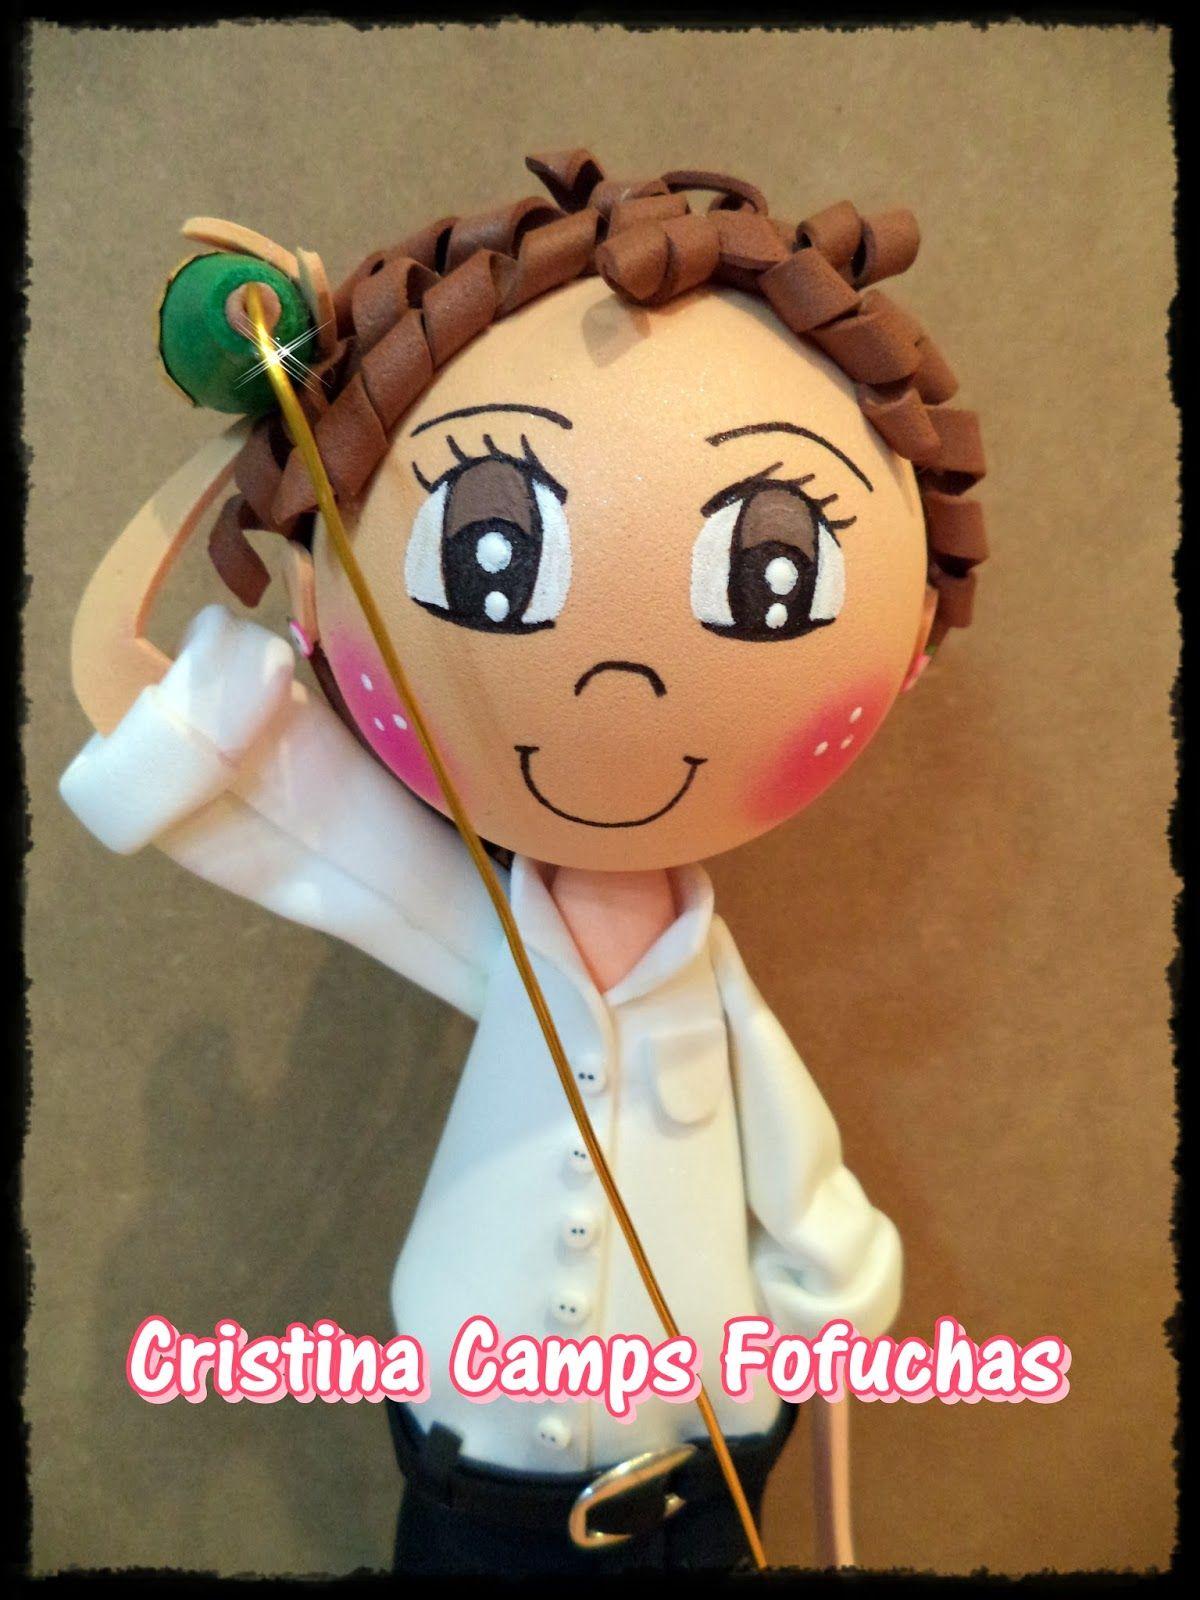 Cristina Camps Fofuchas: Fofucha escanciando sidra.